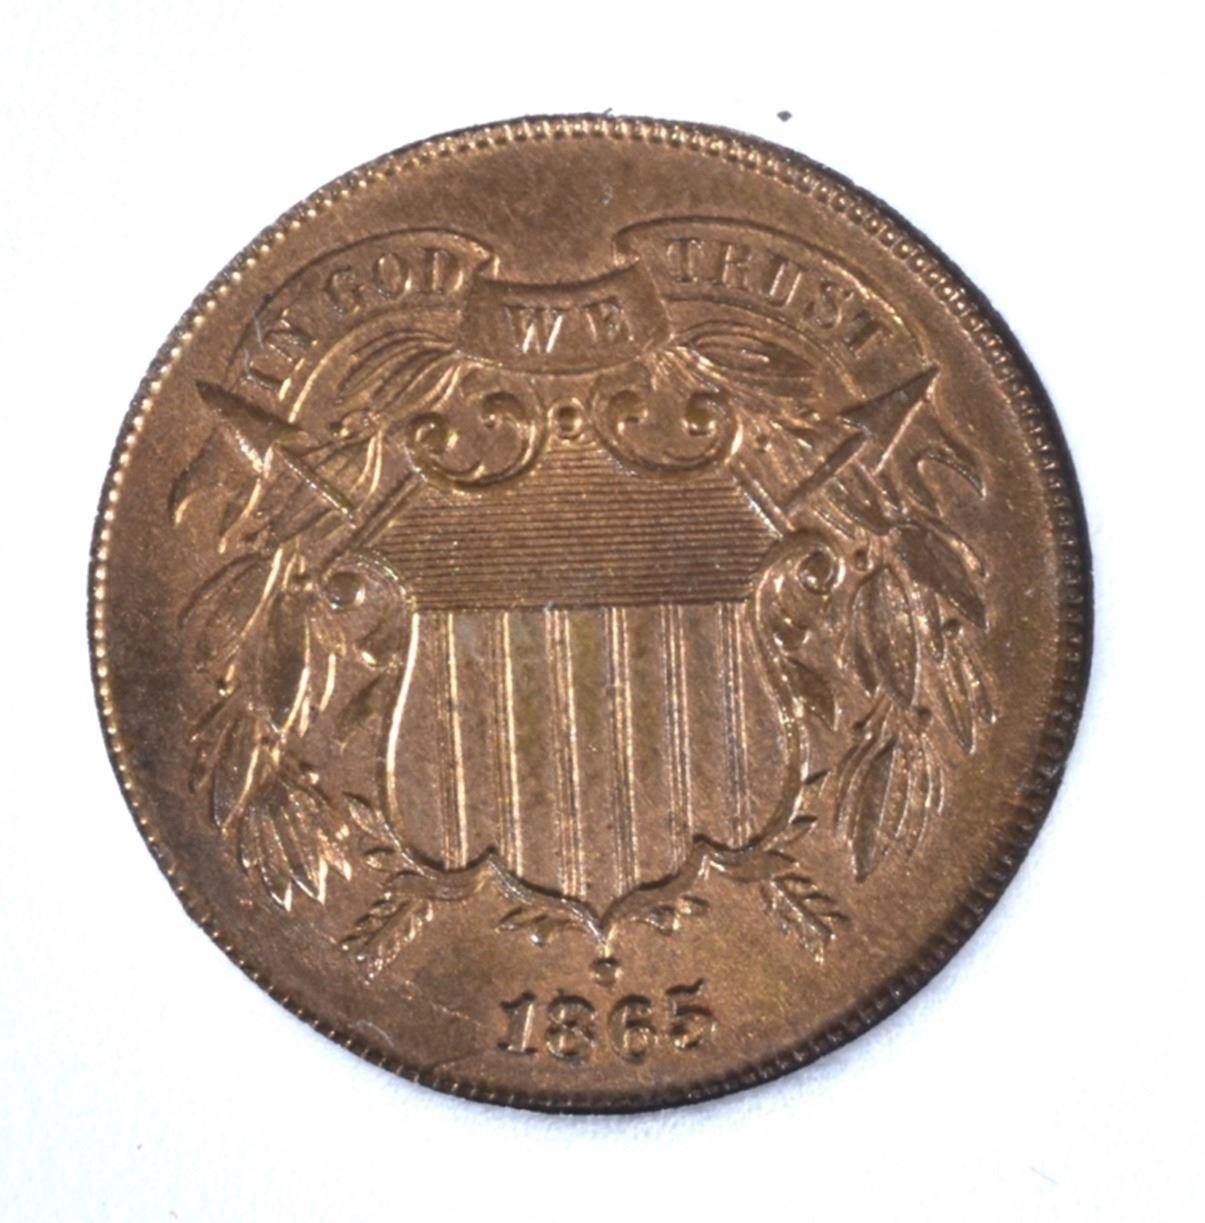 Image 2 1865 TWO CENT PIECE CCGS GEM BU RD